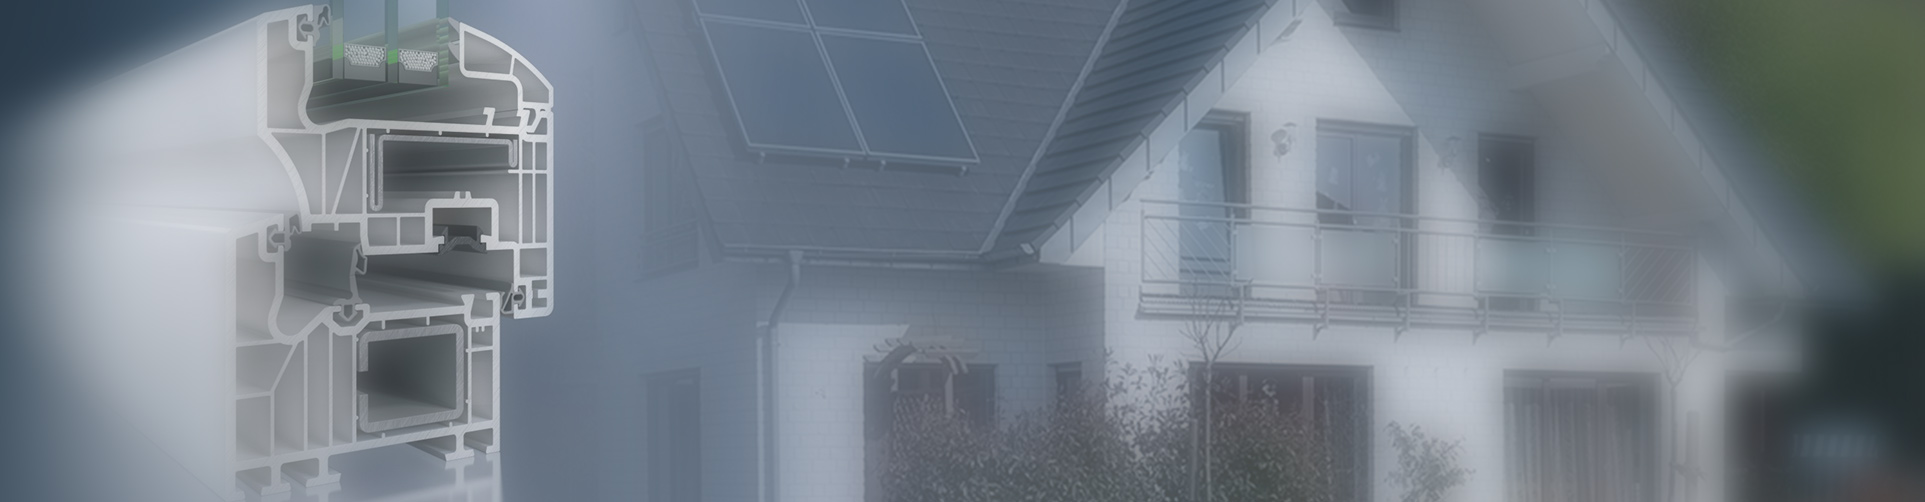 Okna PCV i aluminium na profilach Schüco